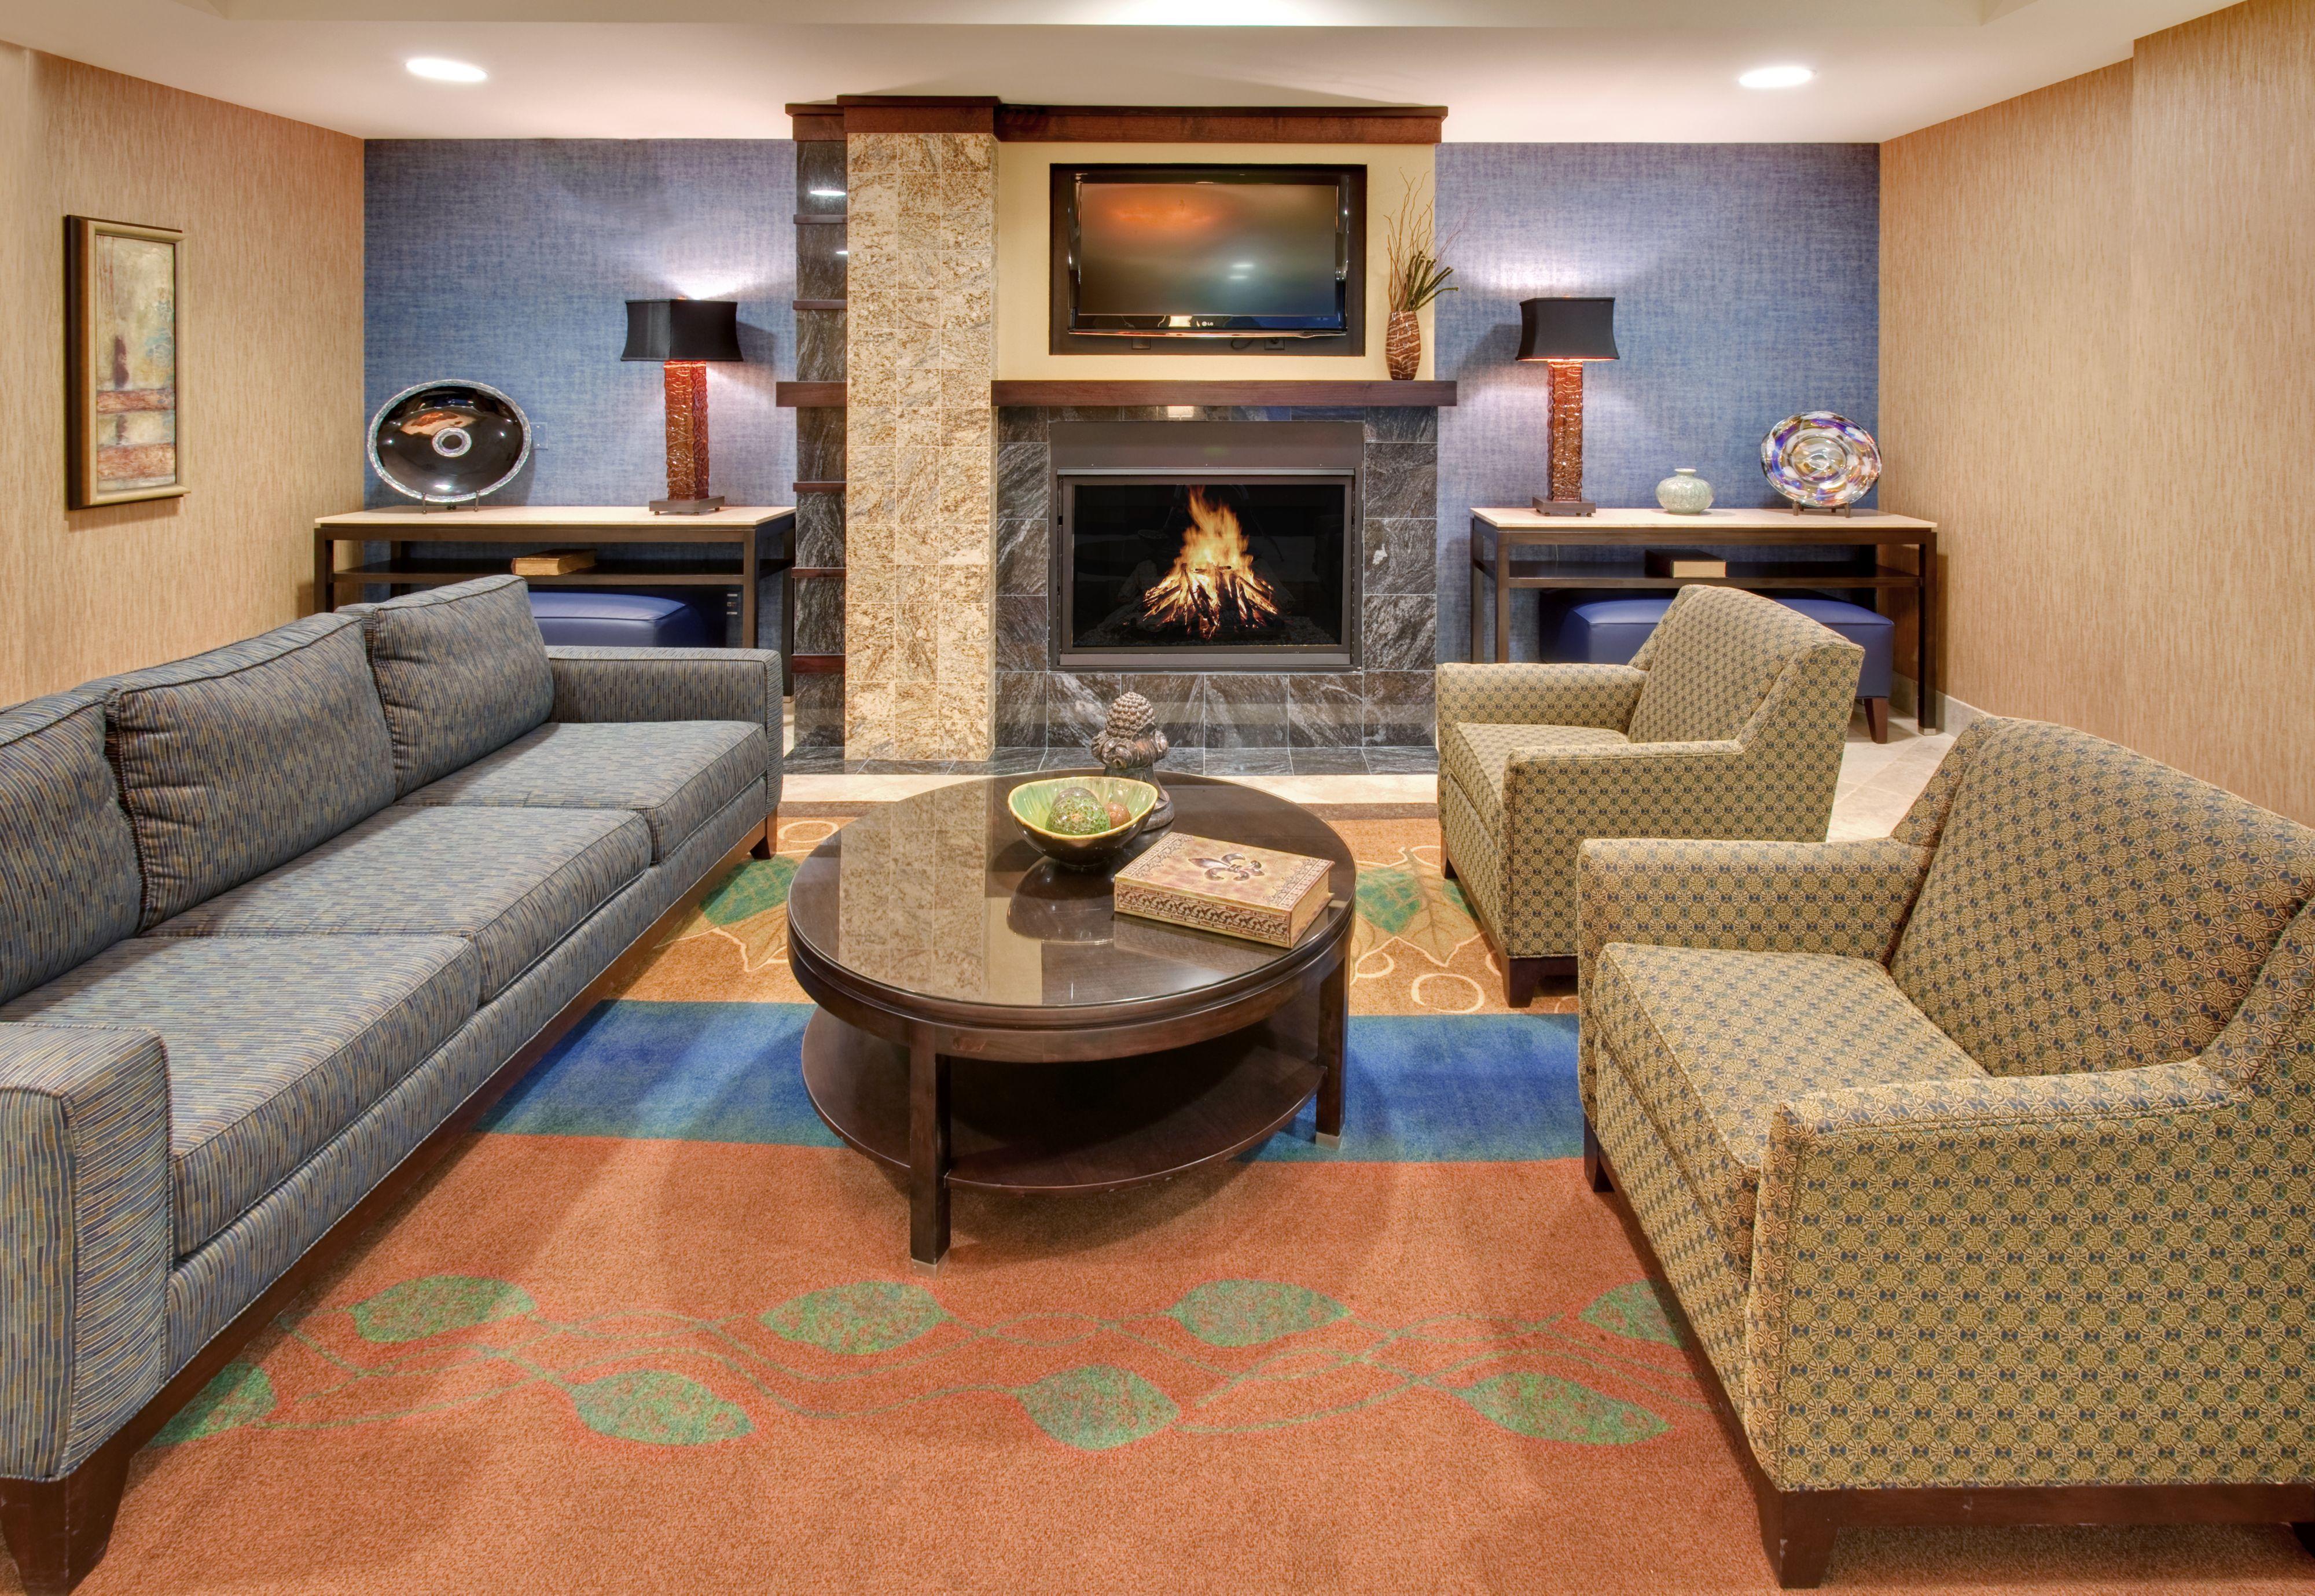 Best Hotels In Grand Island Nebraska